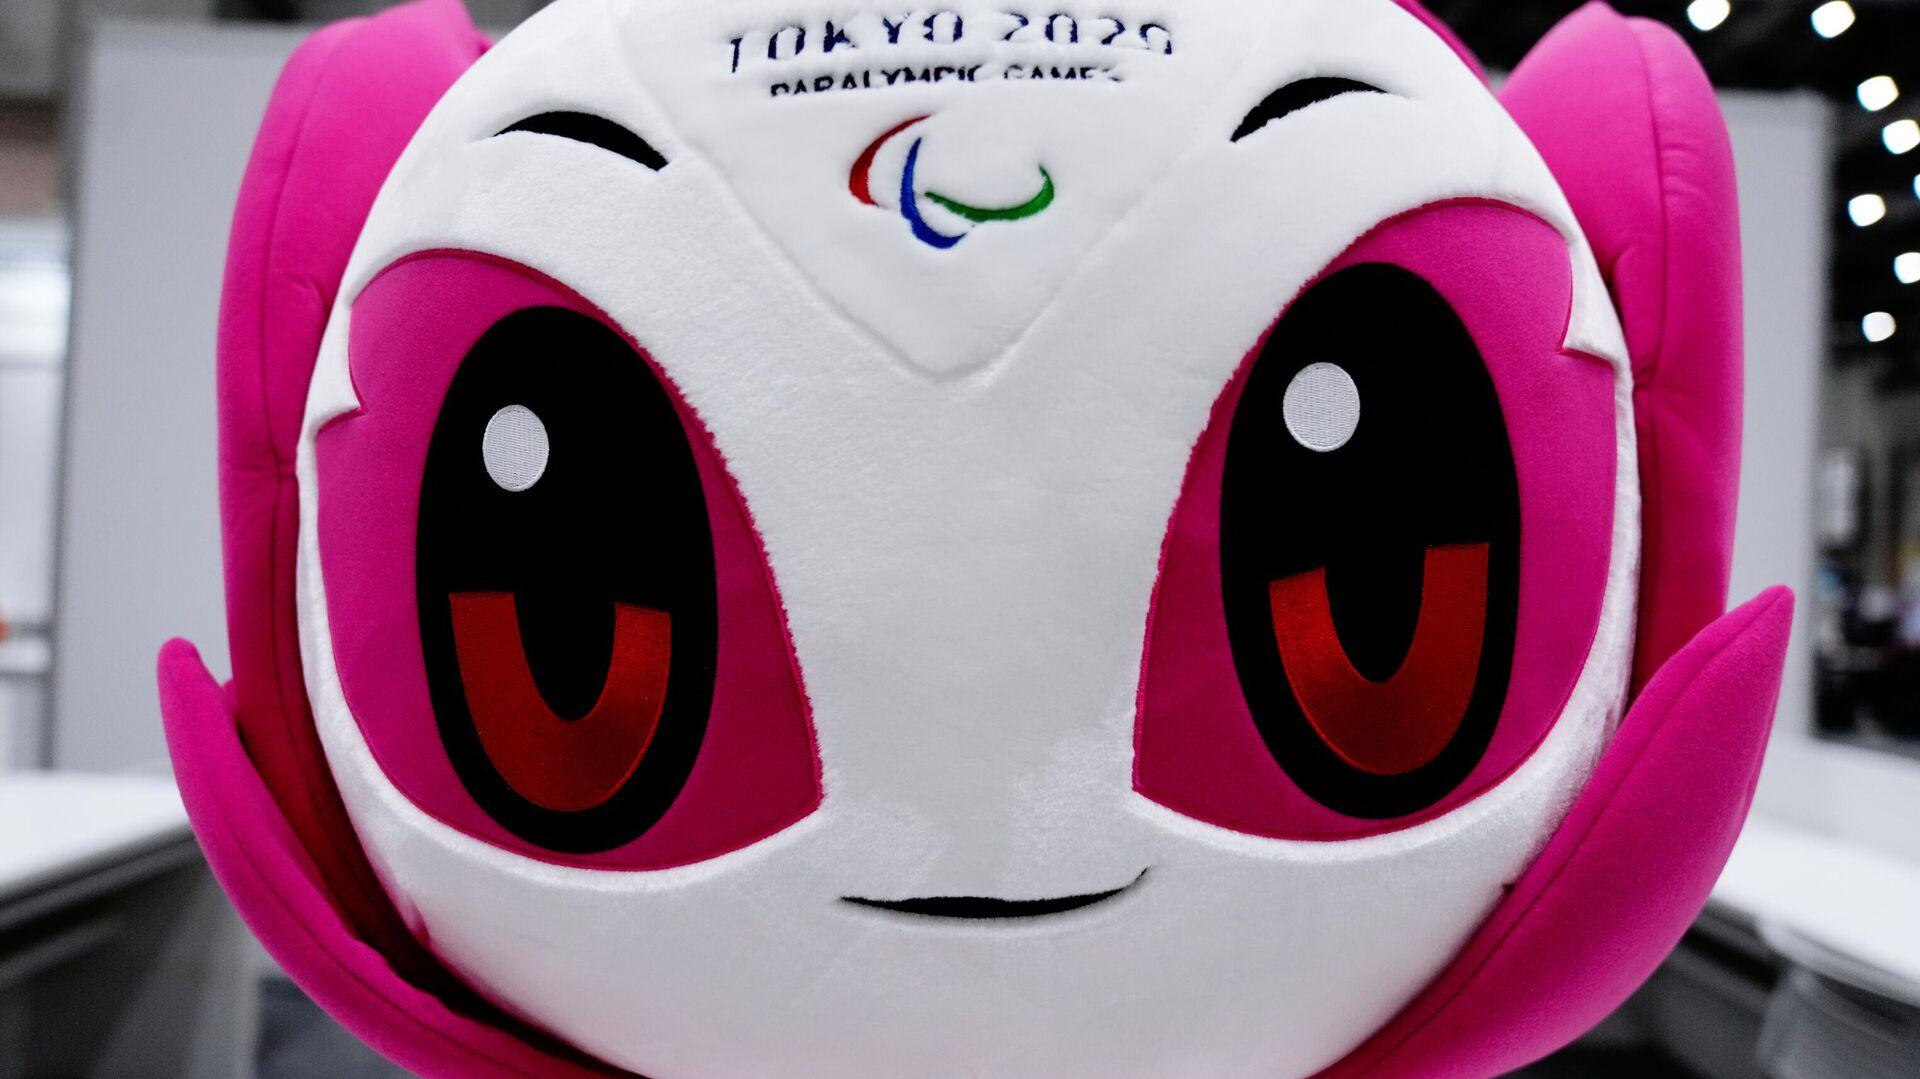 La mascotte delle Paralimpiadi Tokyo 2020 - Sputnik Italia, 1920, 21.08.2021